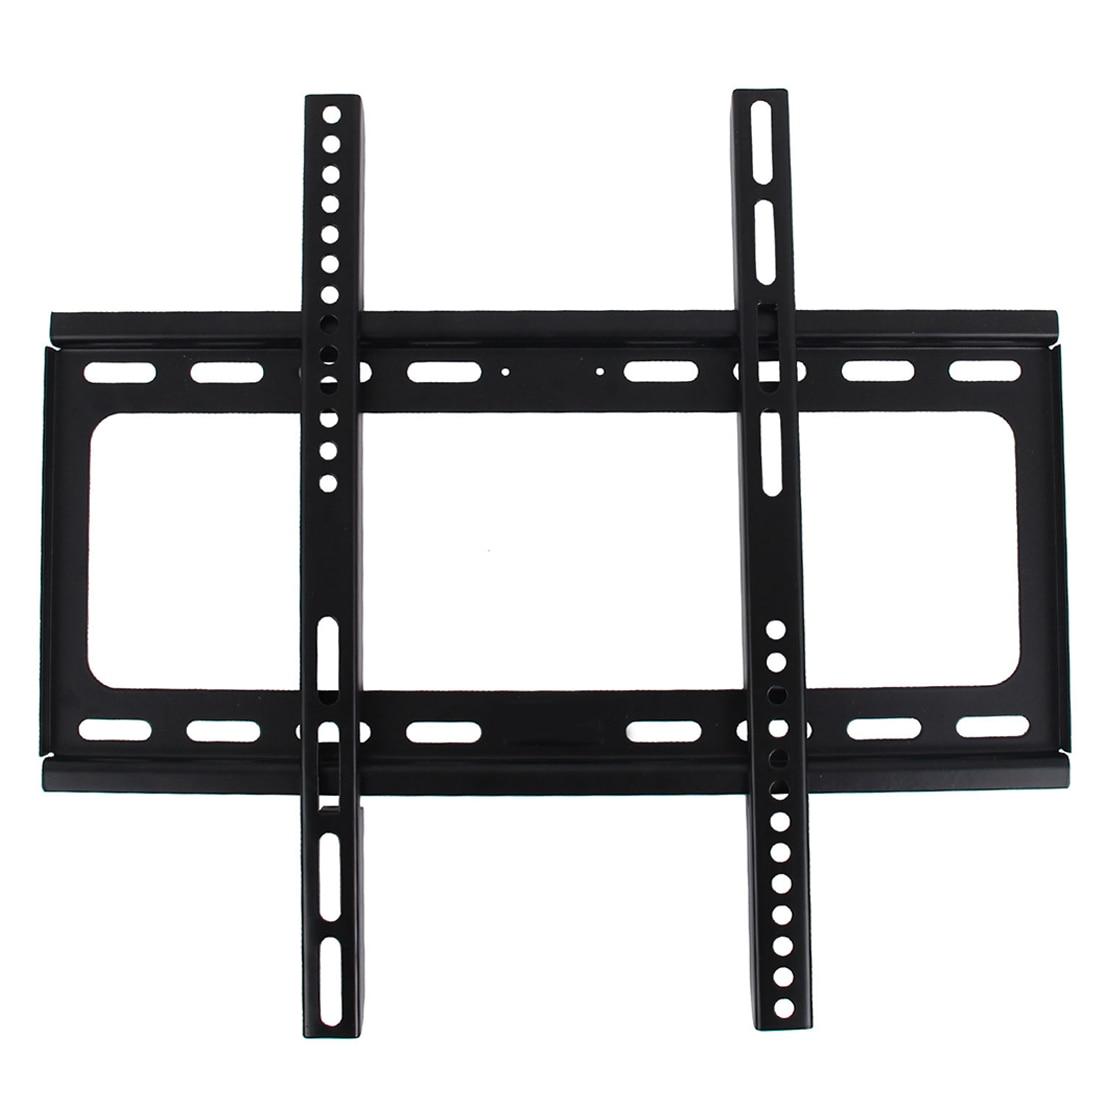 Plasma LCD LED 3D TV Wall Bracket Mount Slim 32 37 40 42 46 48 50 55Plasma LCD LED 3D TV Wall Bracket Mount Slim 32 37 40 42 46 48 50 55